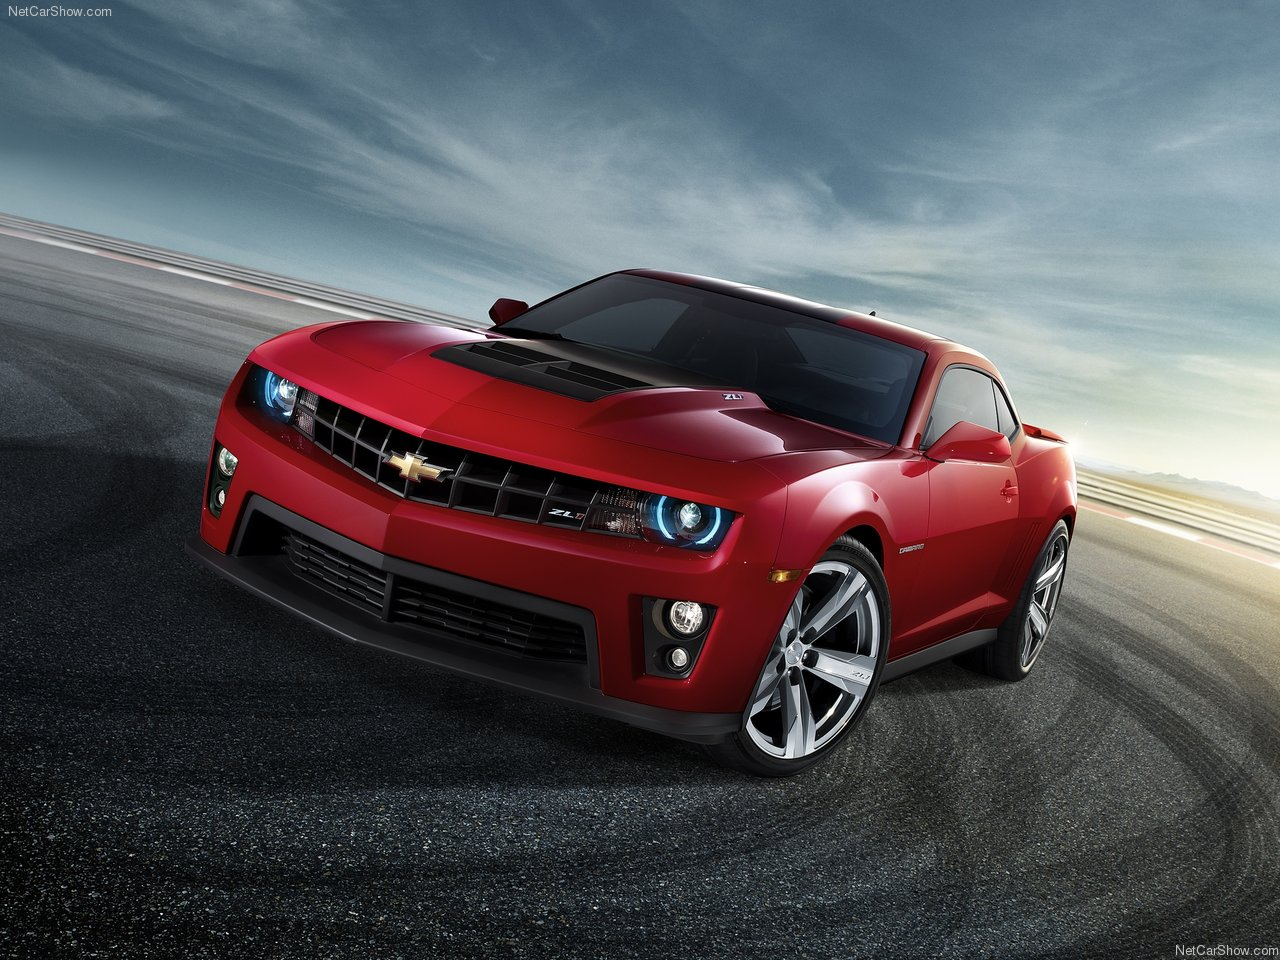 Chevrolet-Camaro_ZL1_2012_1280x960_wallpaper_02.jpg